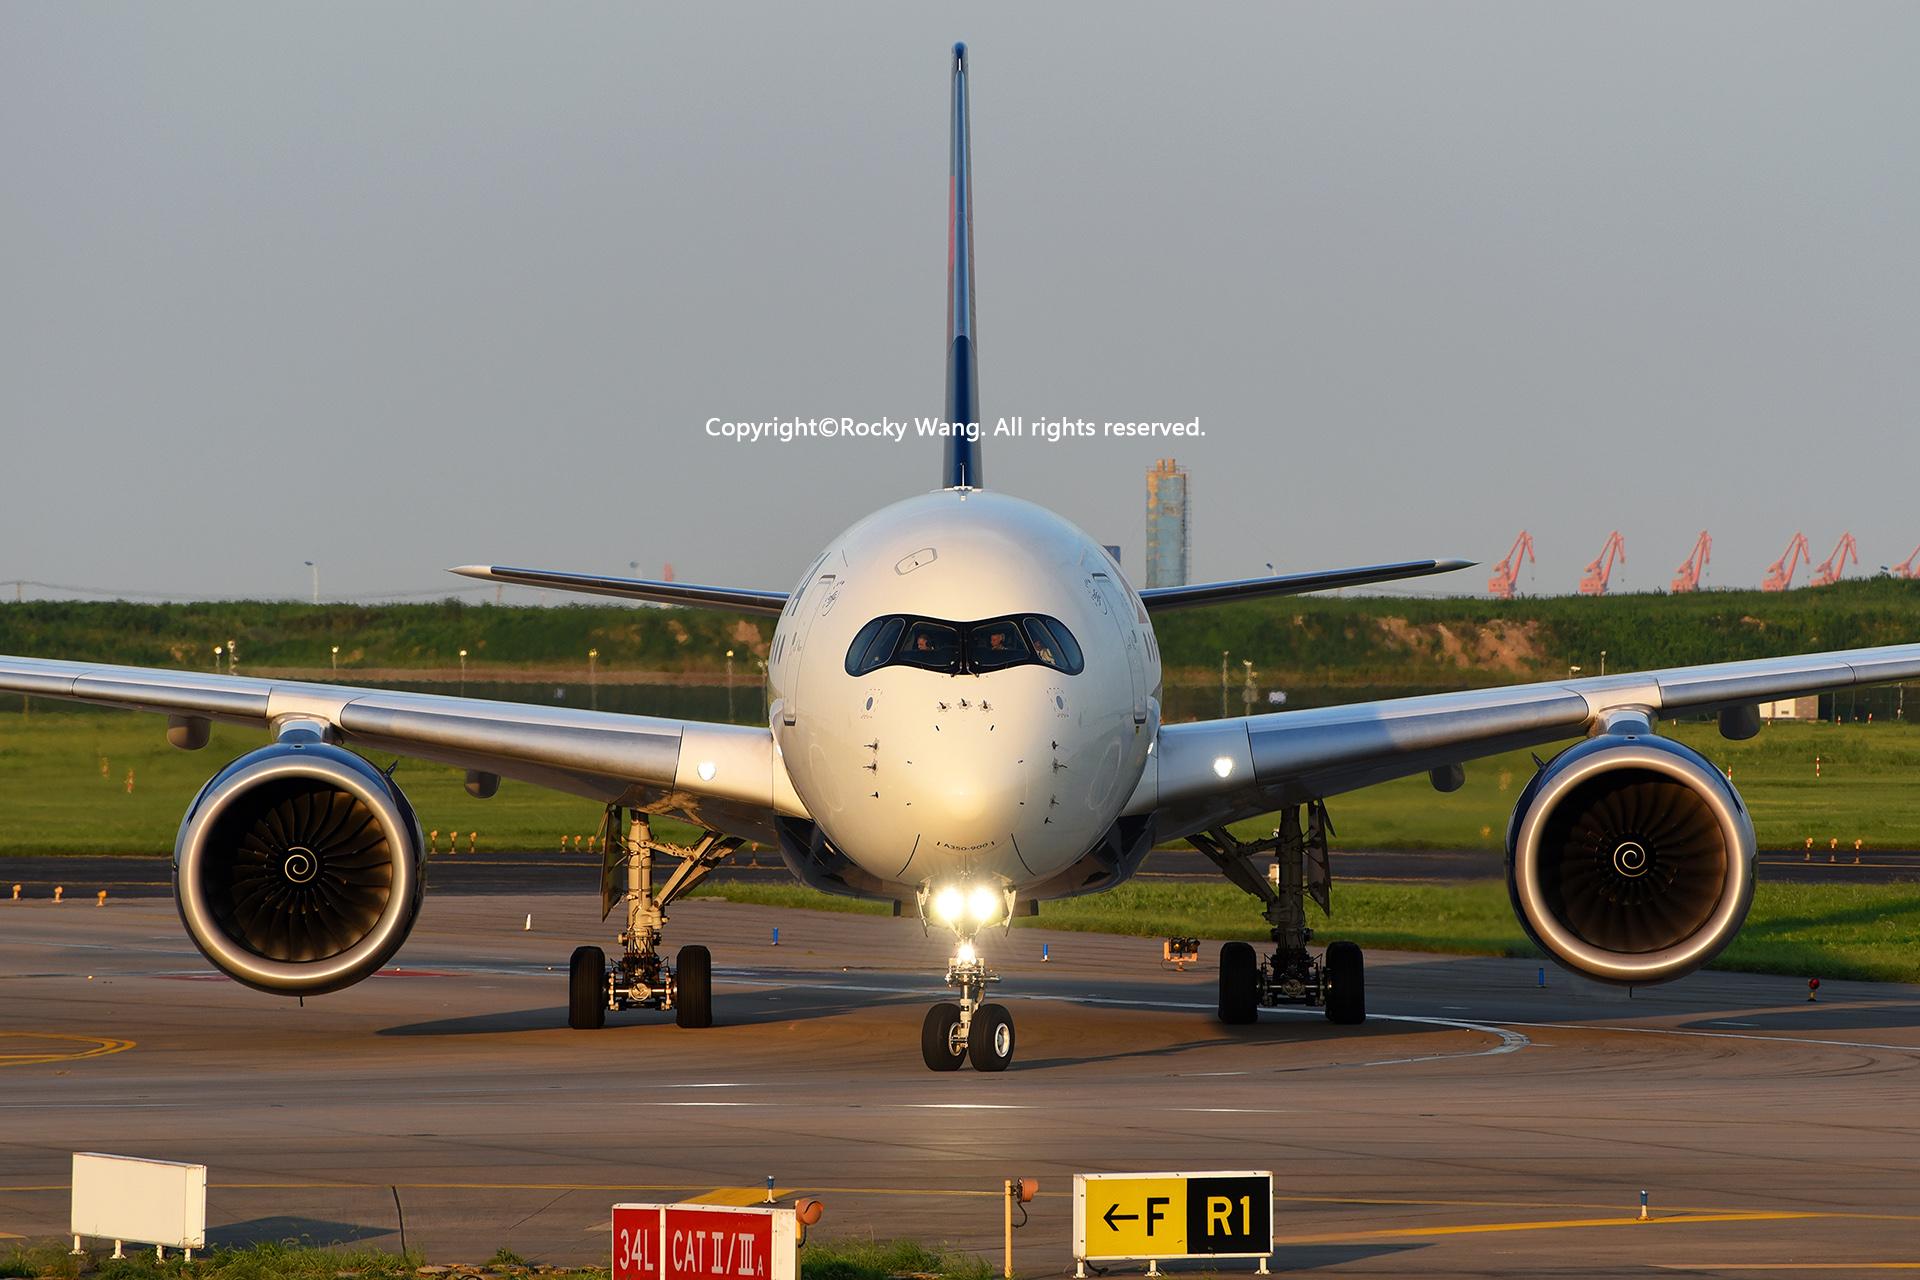 Re:[原创]盗图就别狂 发组表情自己体会 AIRBUS A350-941 N505DN Shanghai Pudong